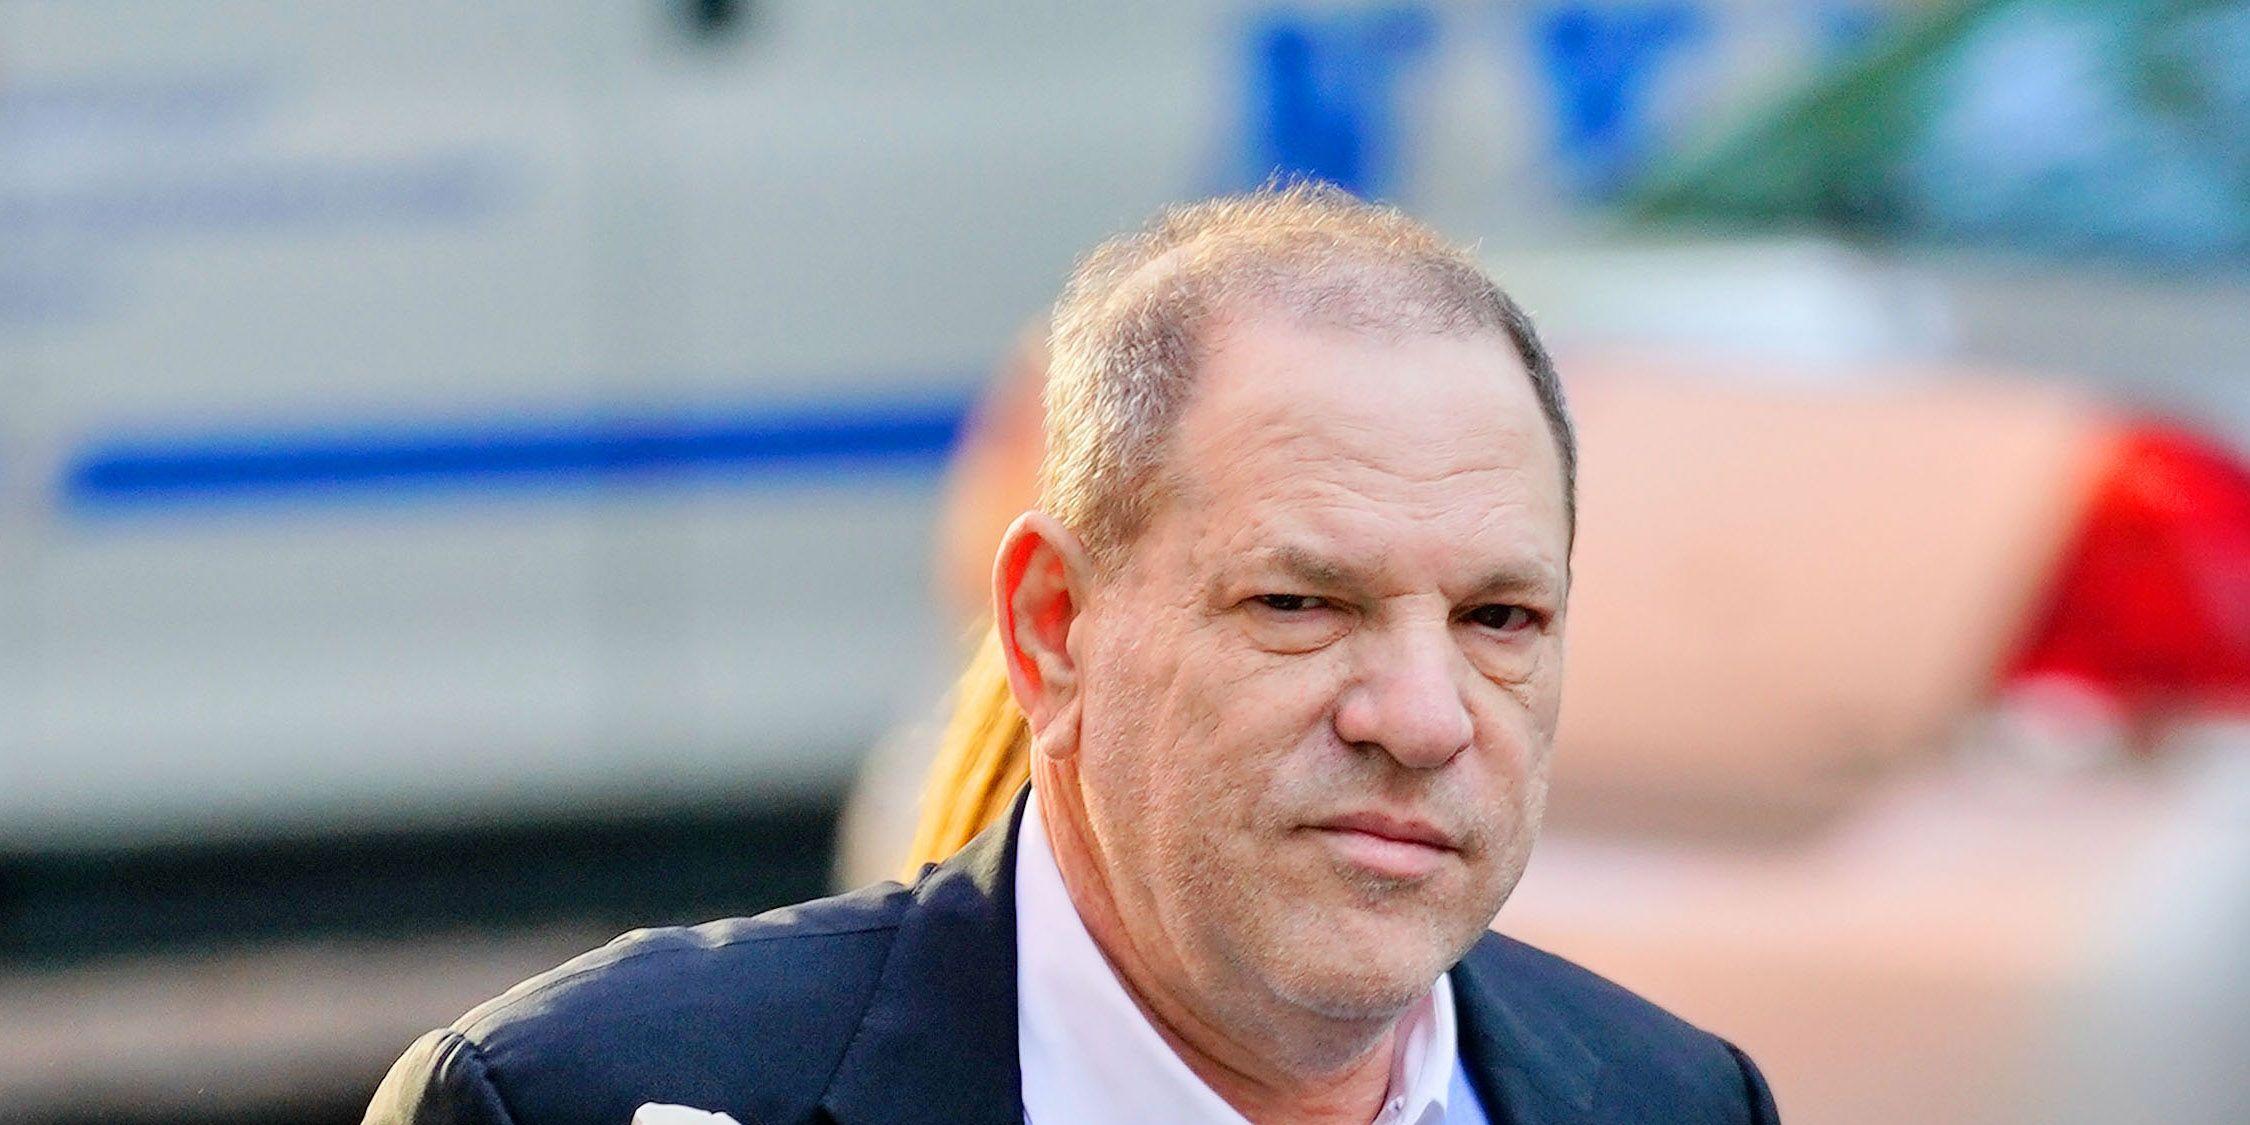 Harvey Weinstein Surrenders to Police